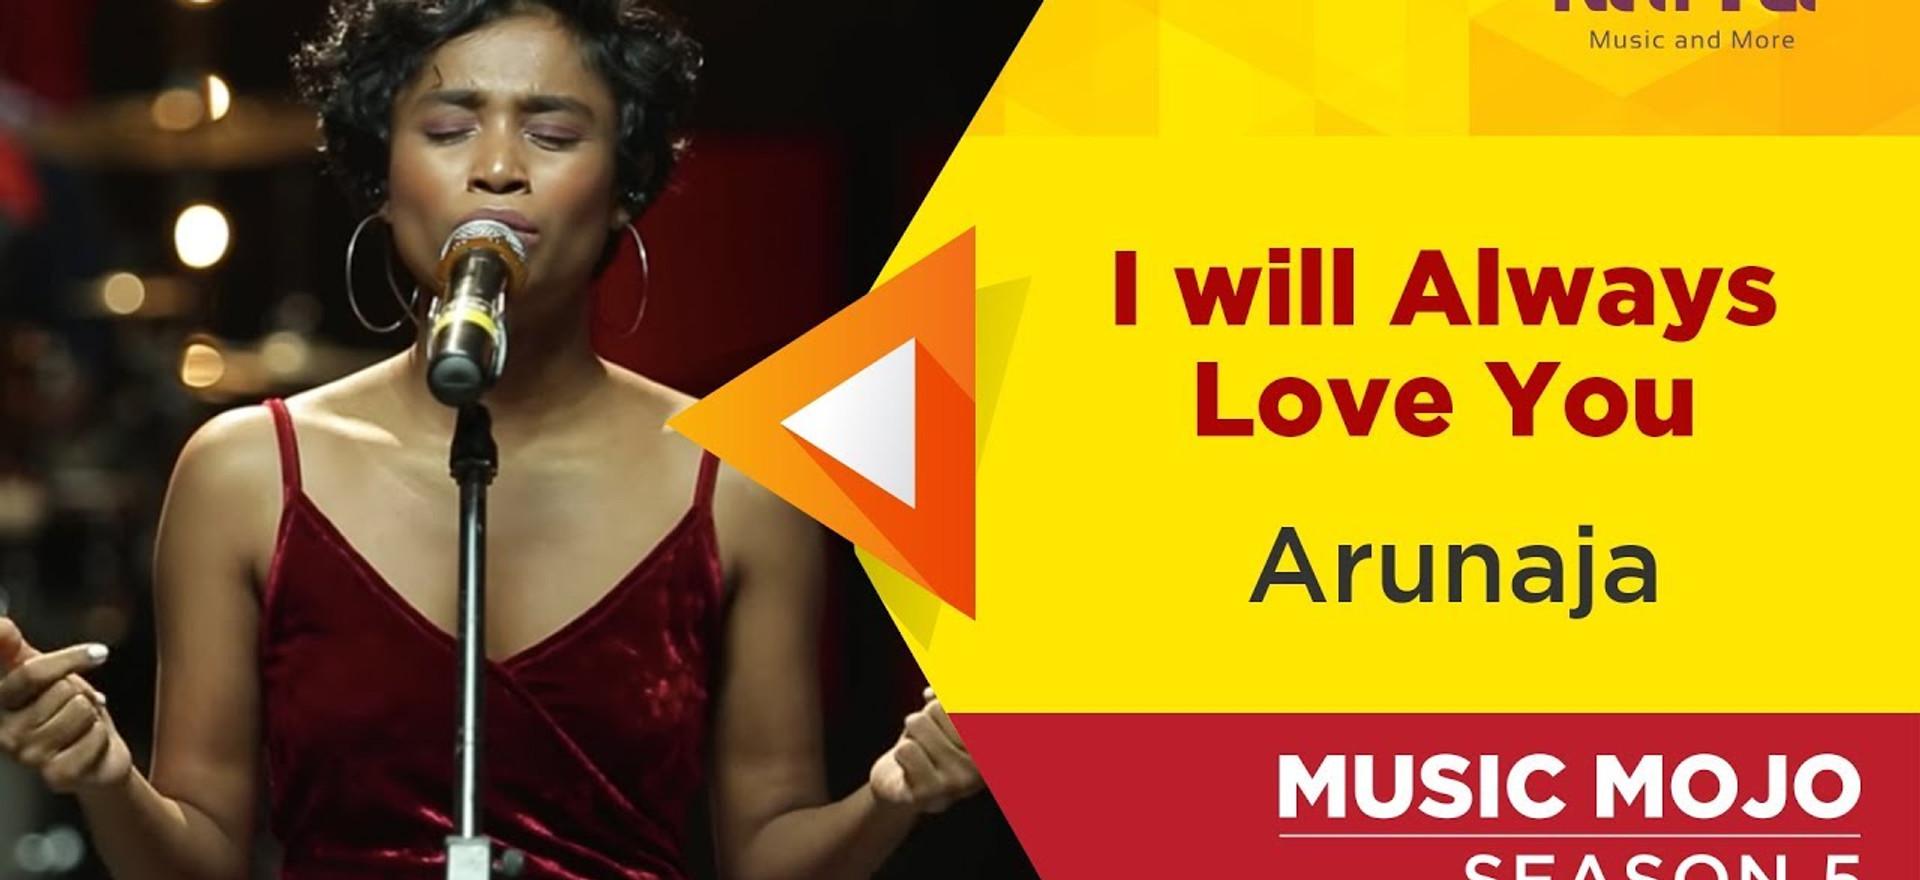 I will Always Love You - Arunaja - Music Mojo Season 5 - Kappa TV